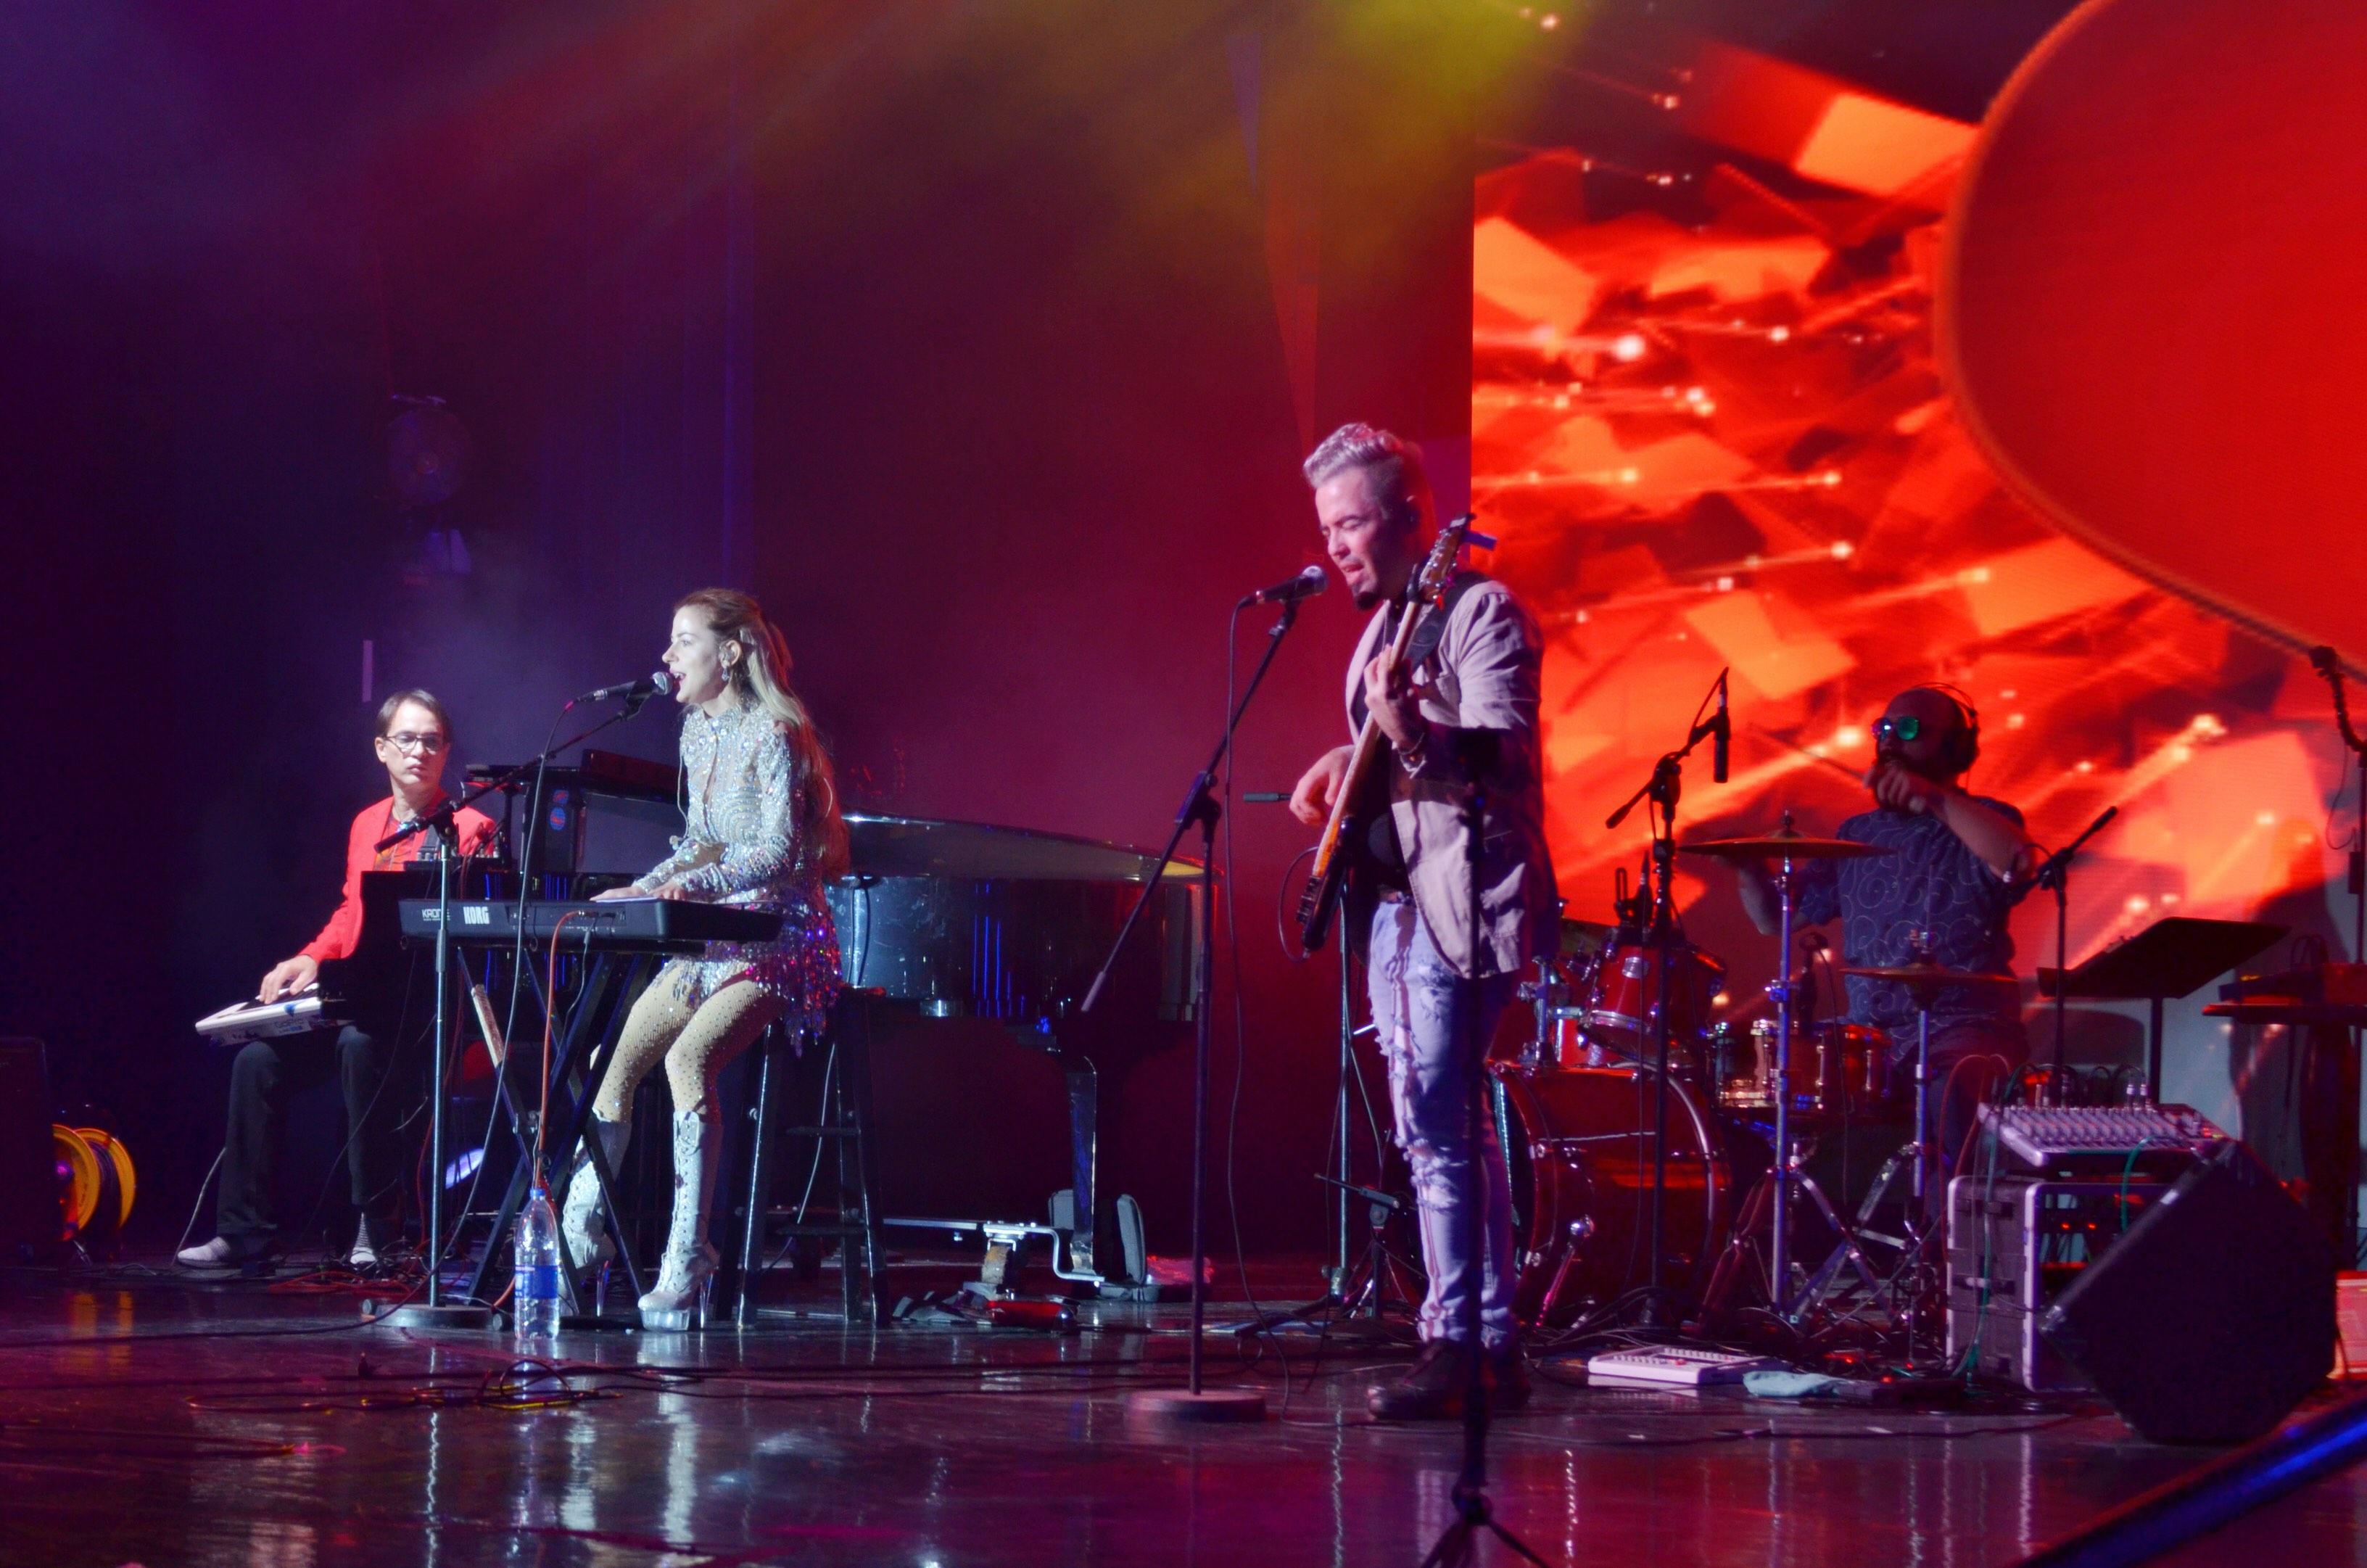 B1 Band Return To Rock The Night At Skysea Cruise Line